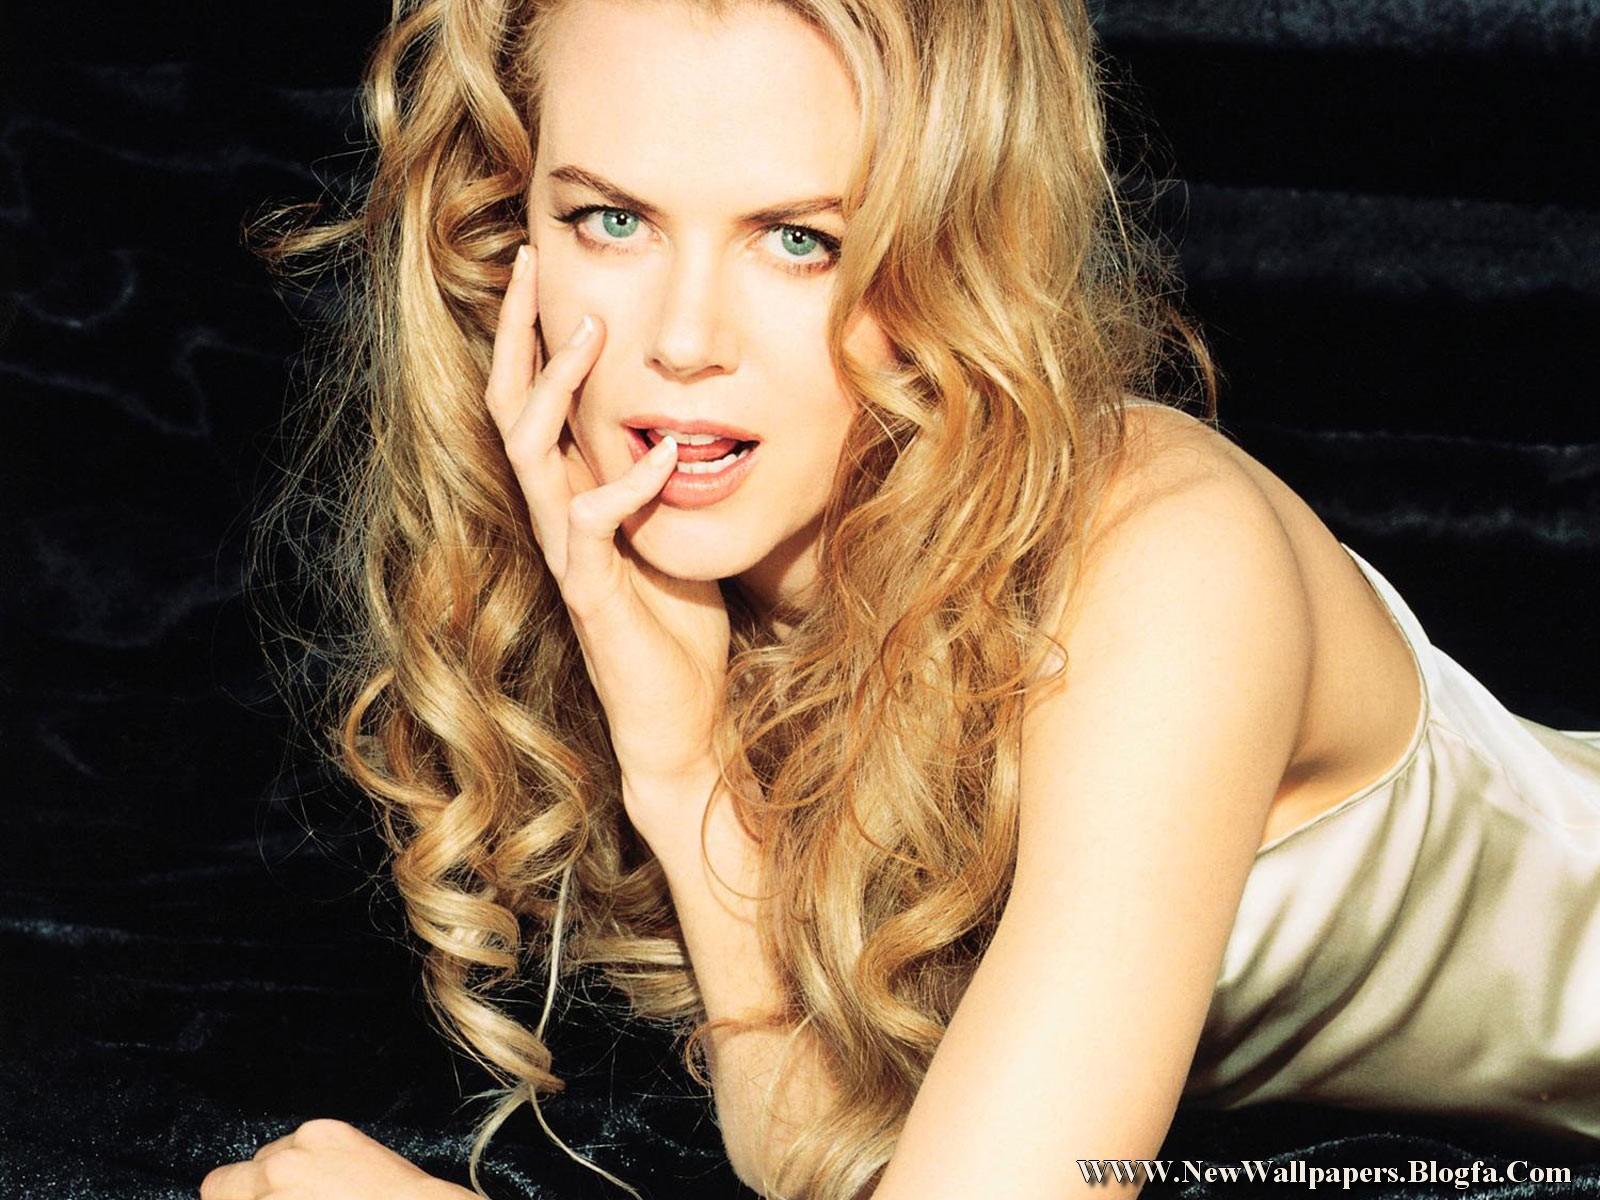 http://4.bp.blogspot.com/-w9irYDj9FAc/Tb71ivAGgKI/AAAAAAAAAdM/nPk5kb0MHoI/s1600/Nicole-Kidman-Pic.jpg